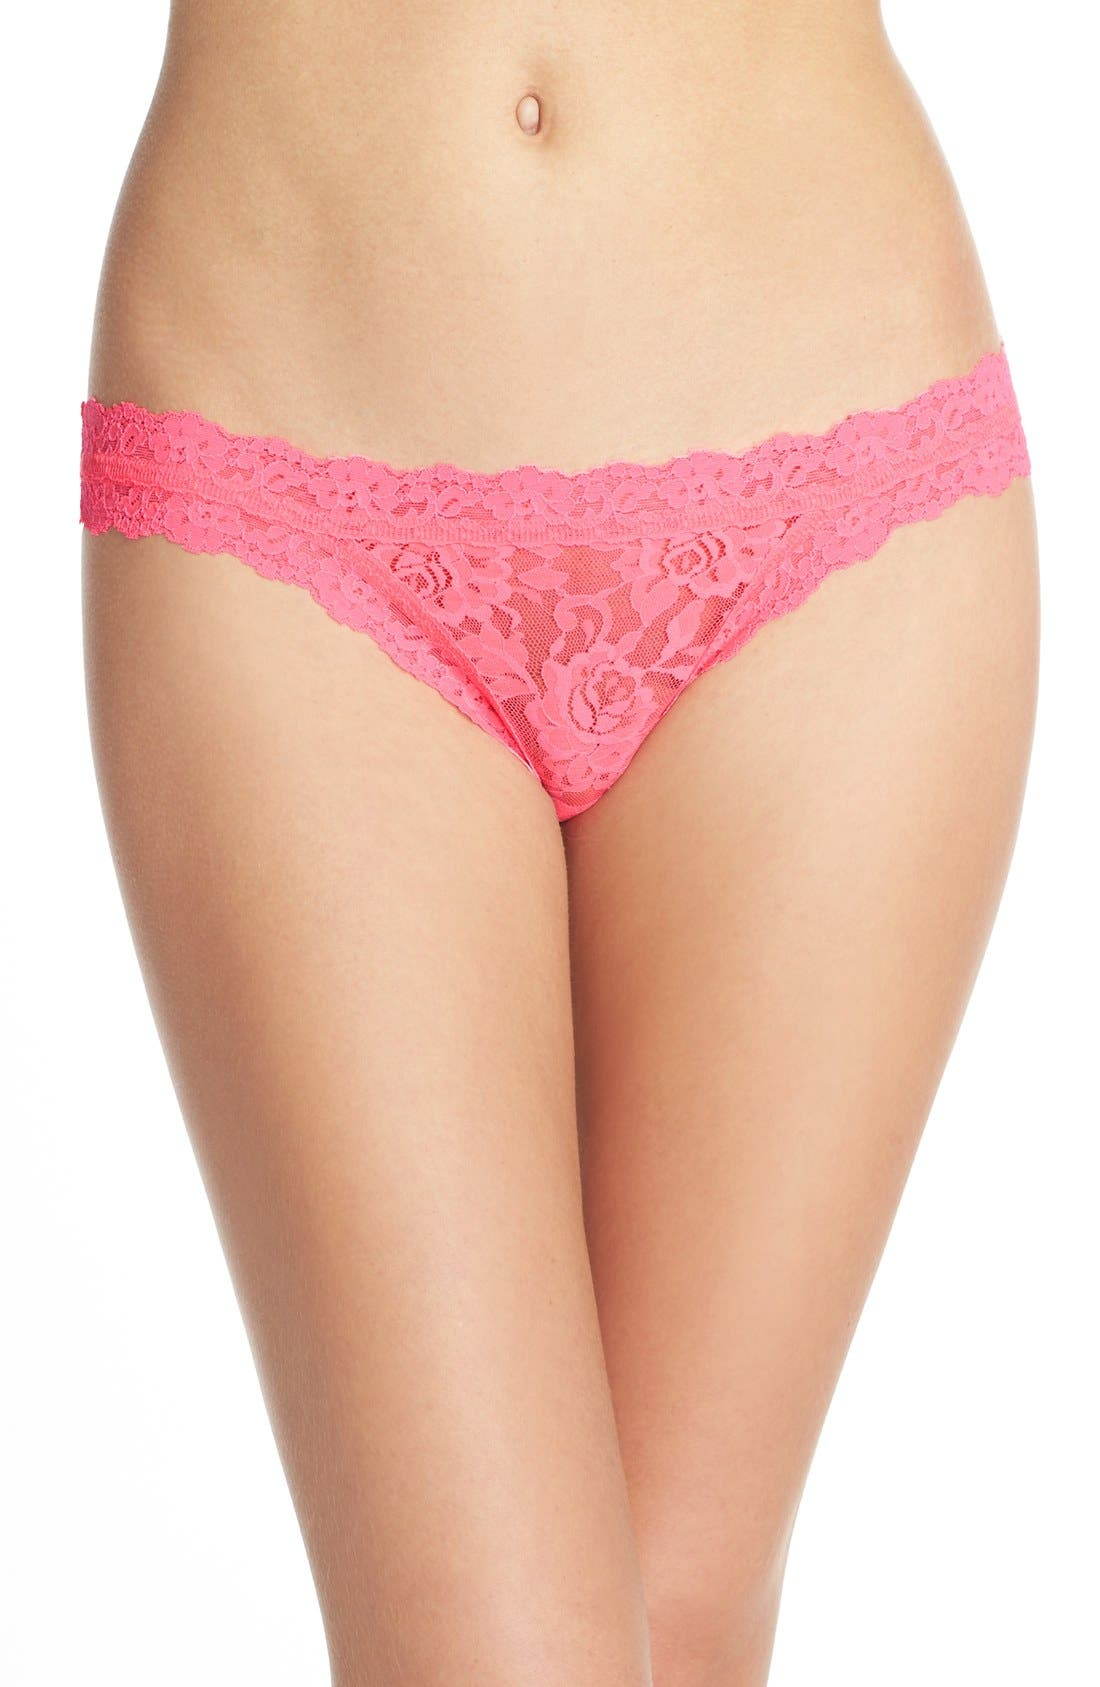 'Signature Lace' Brazilian Bikini,                             Main thumbnail 24, color,